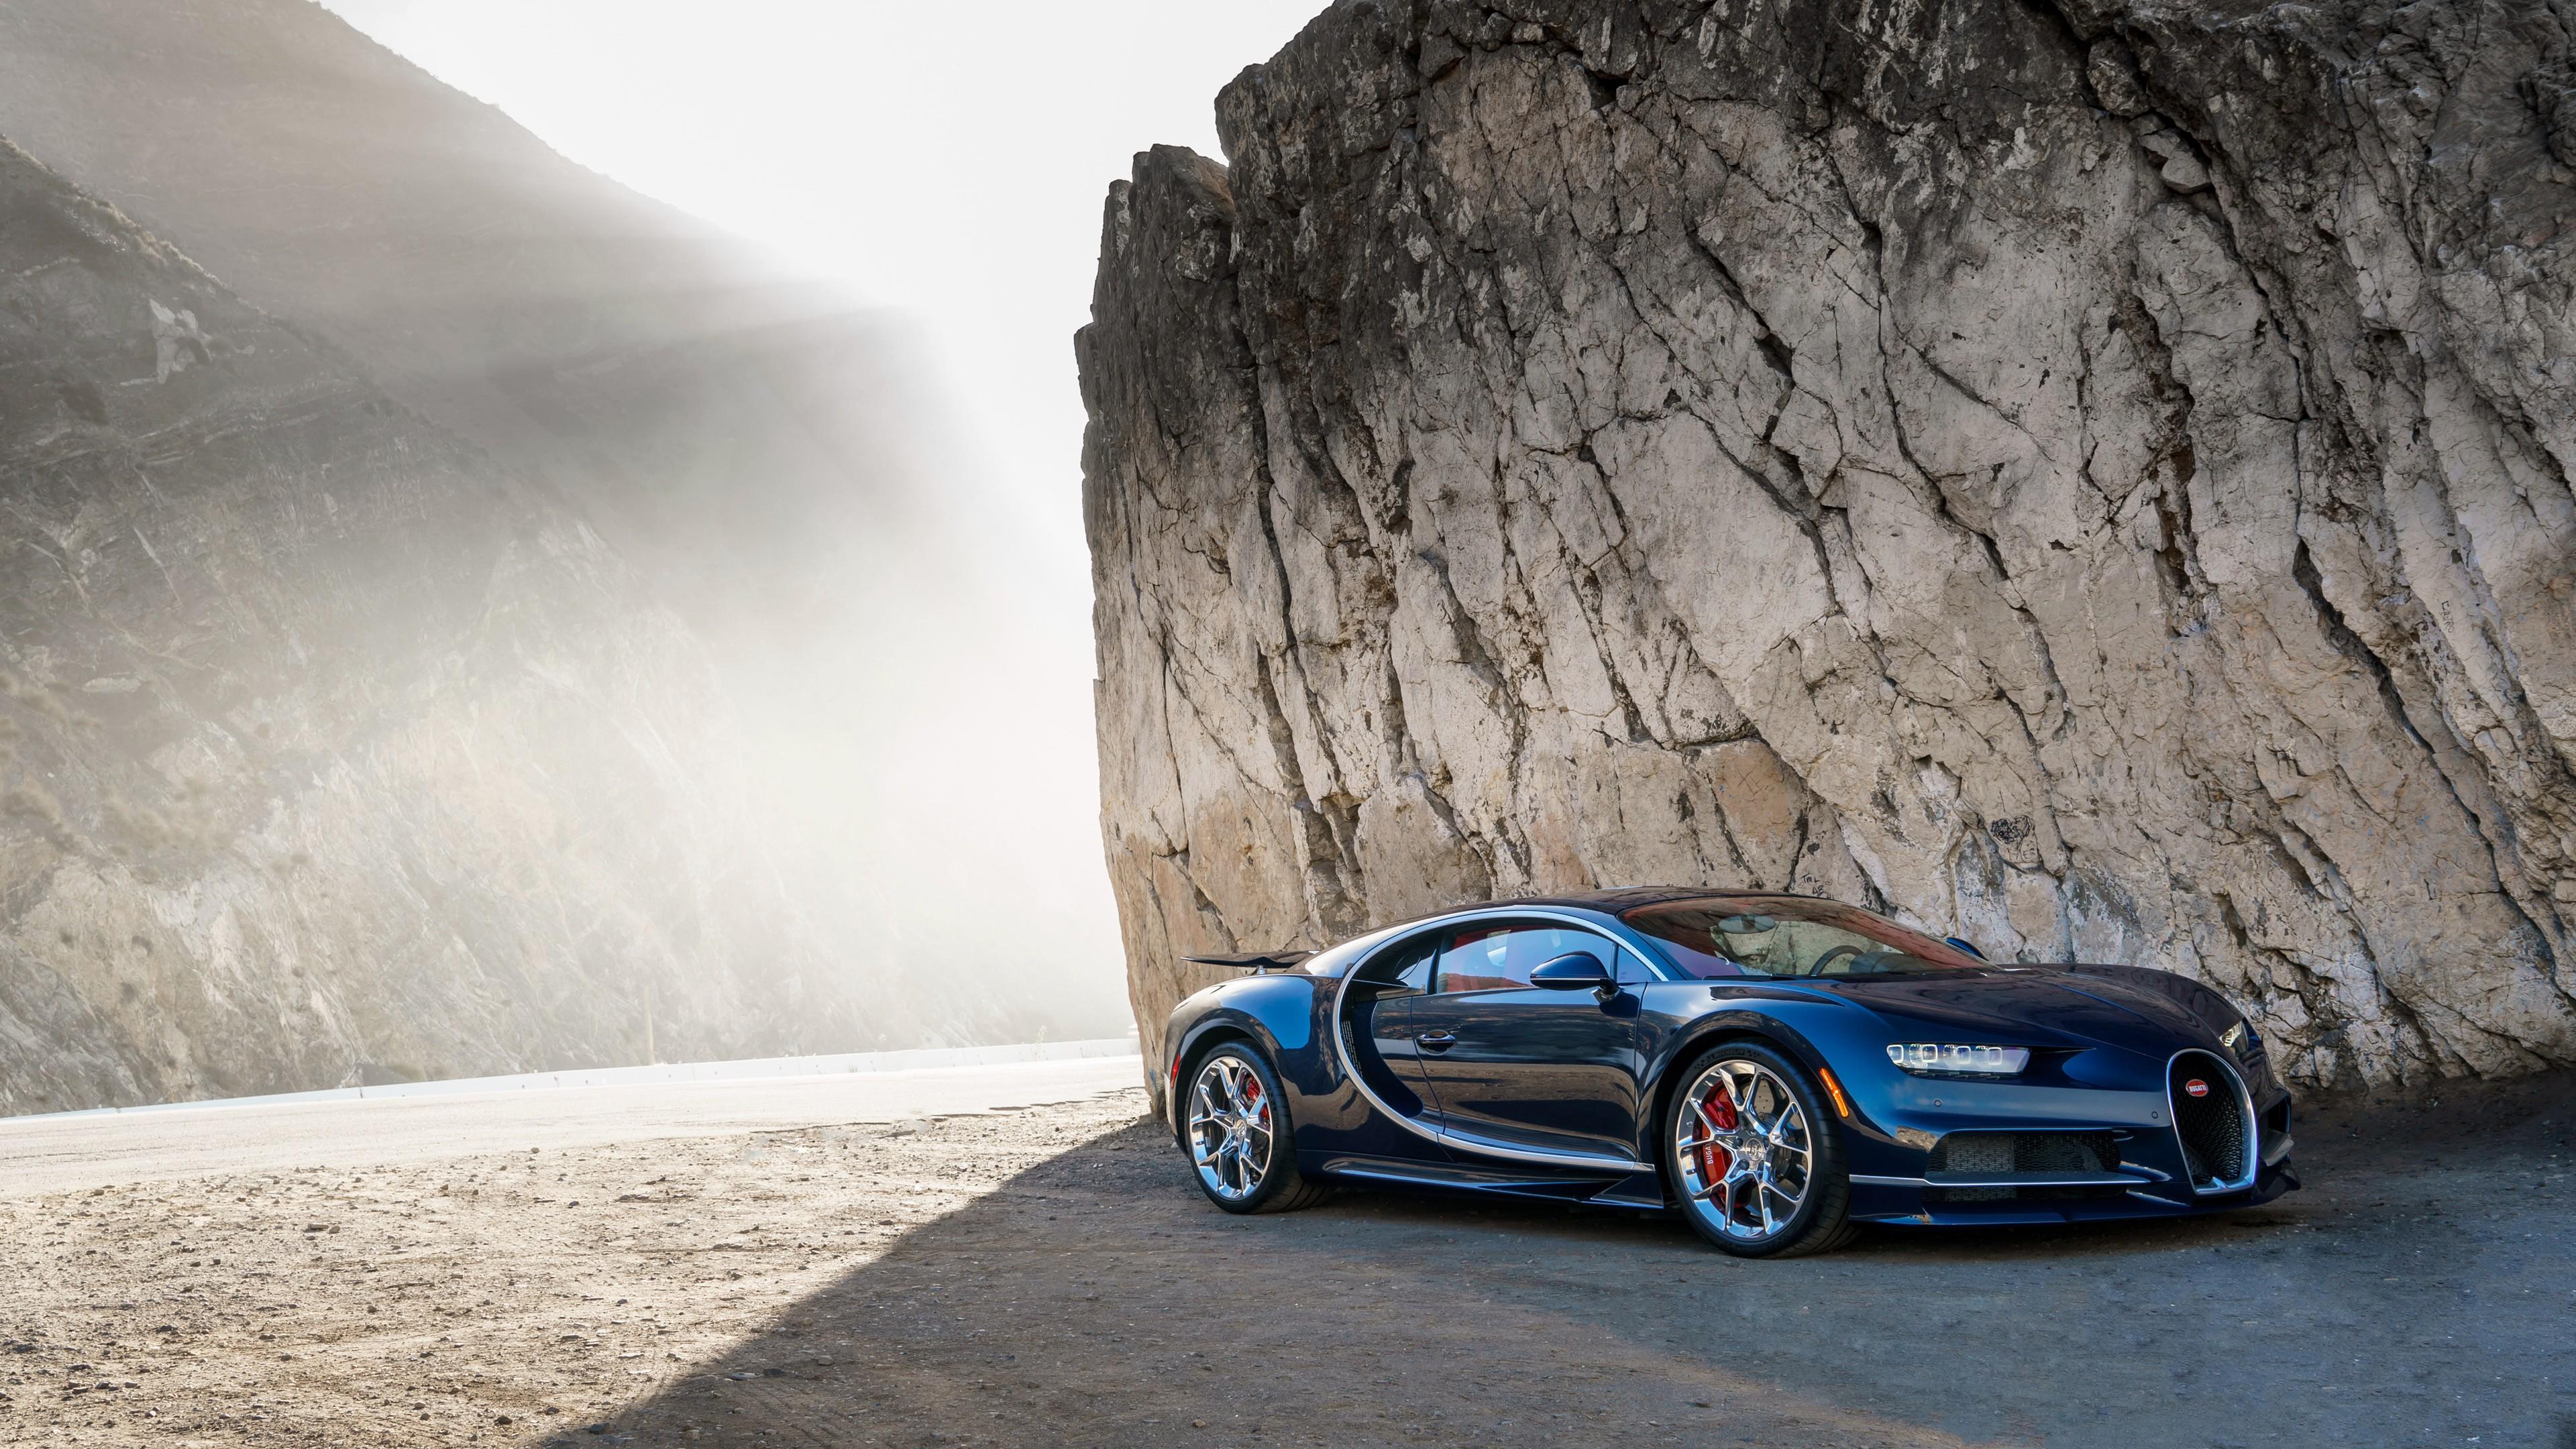 2018 Bugatti Chiron Wallpaper